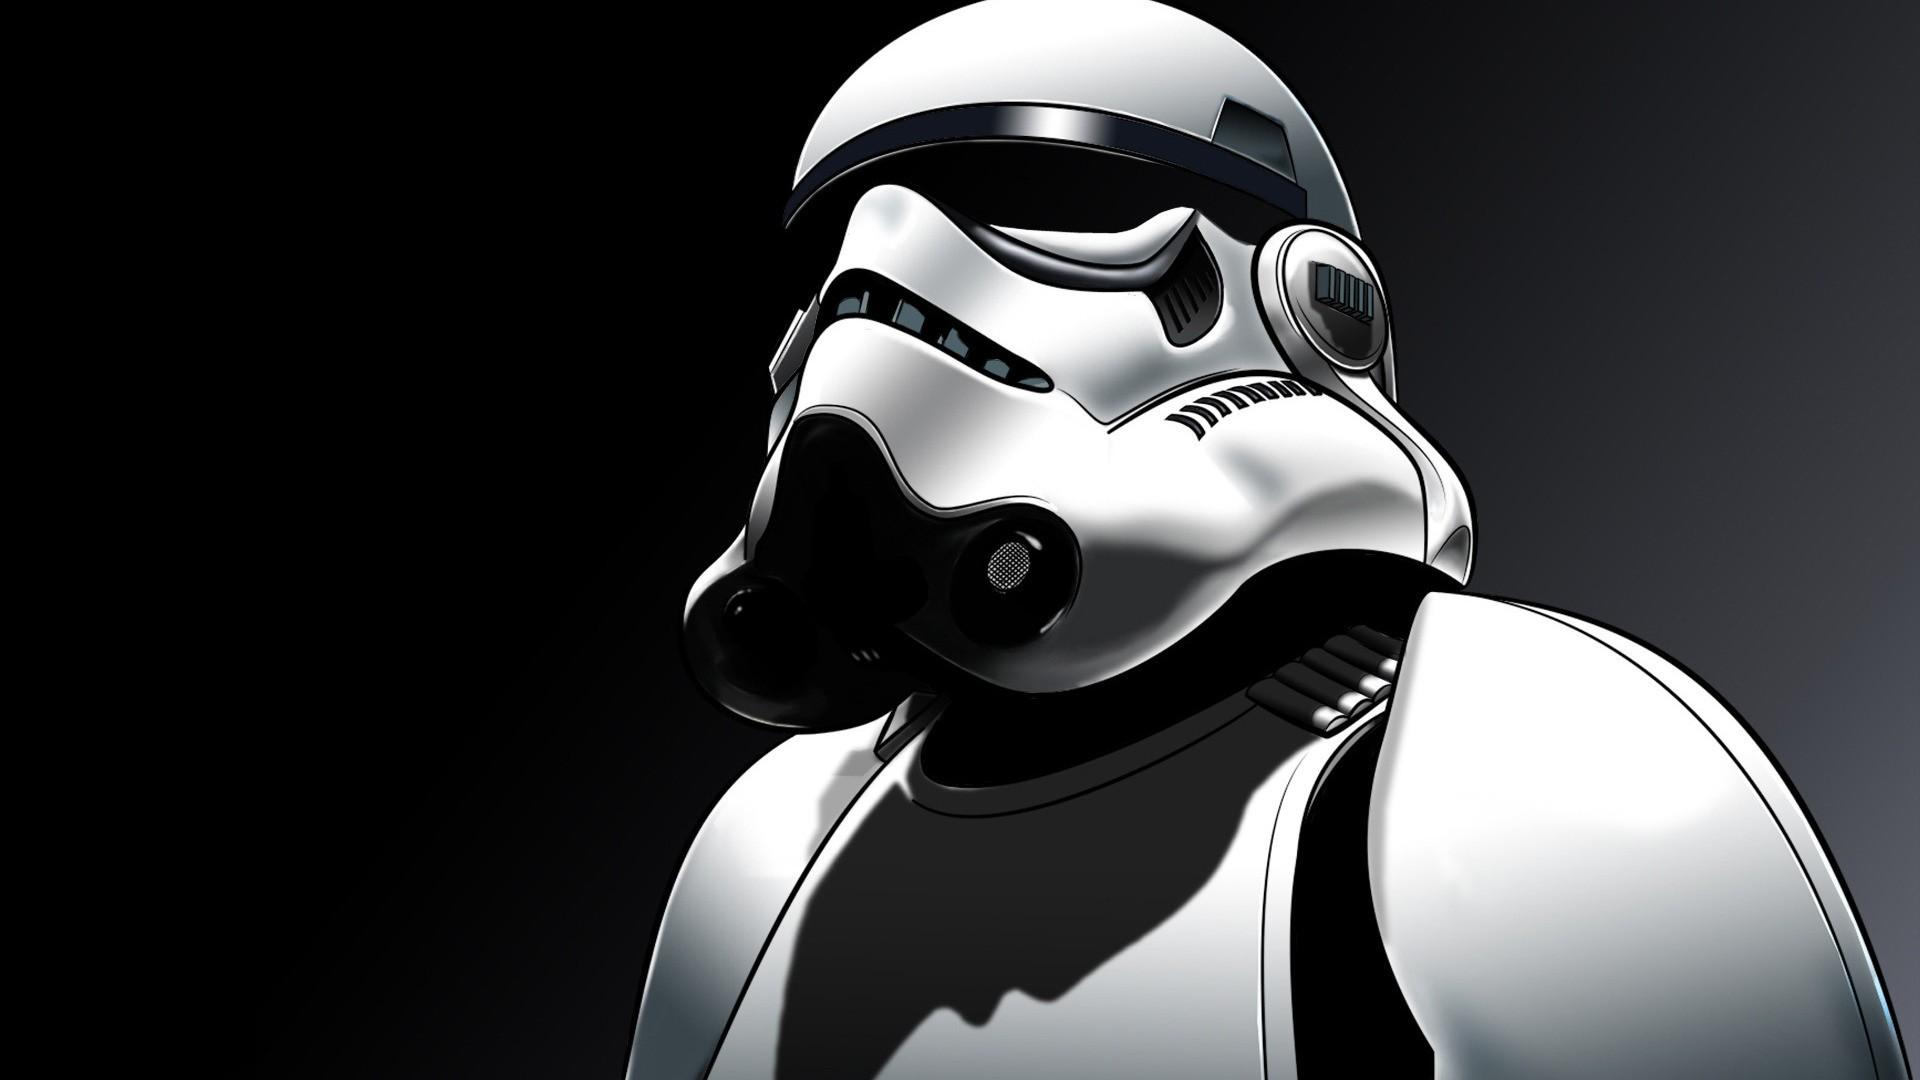 Star Wars Wallpaper Star, Wars, Stormtroopers